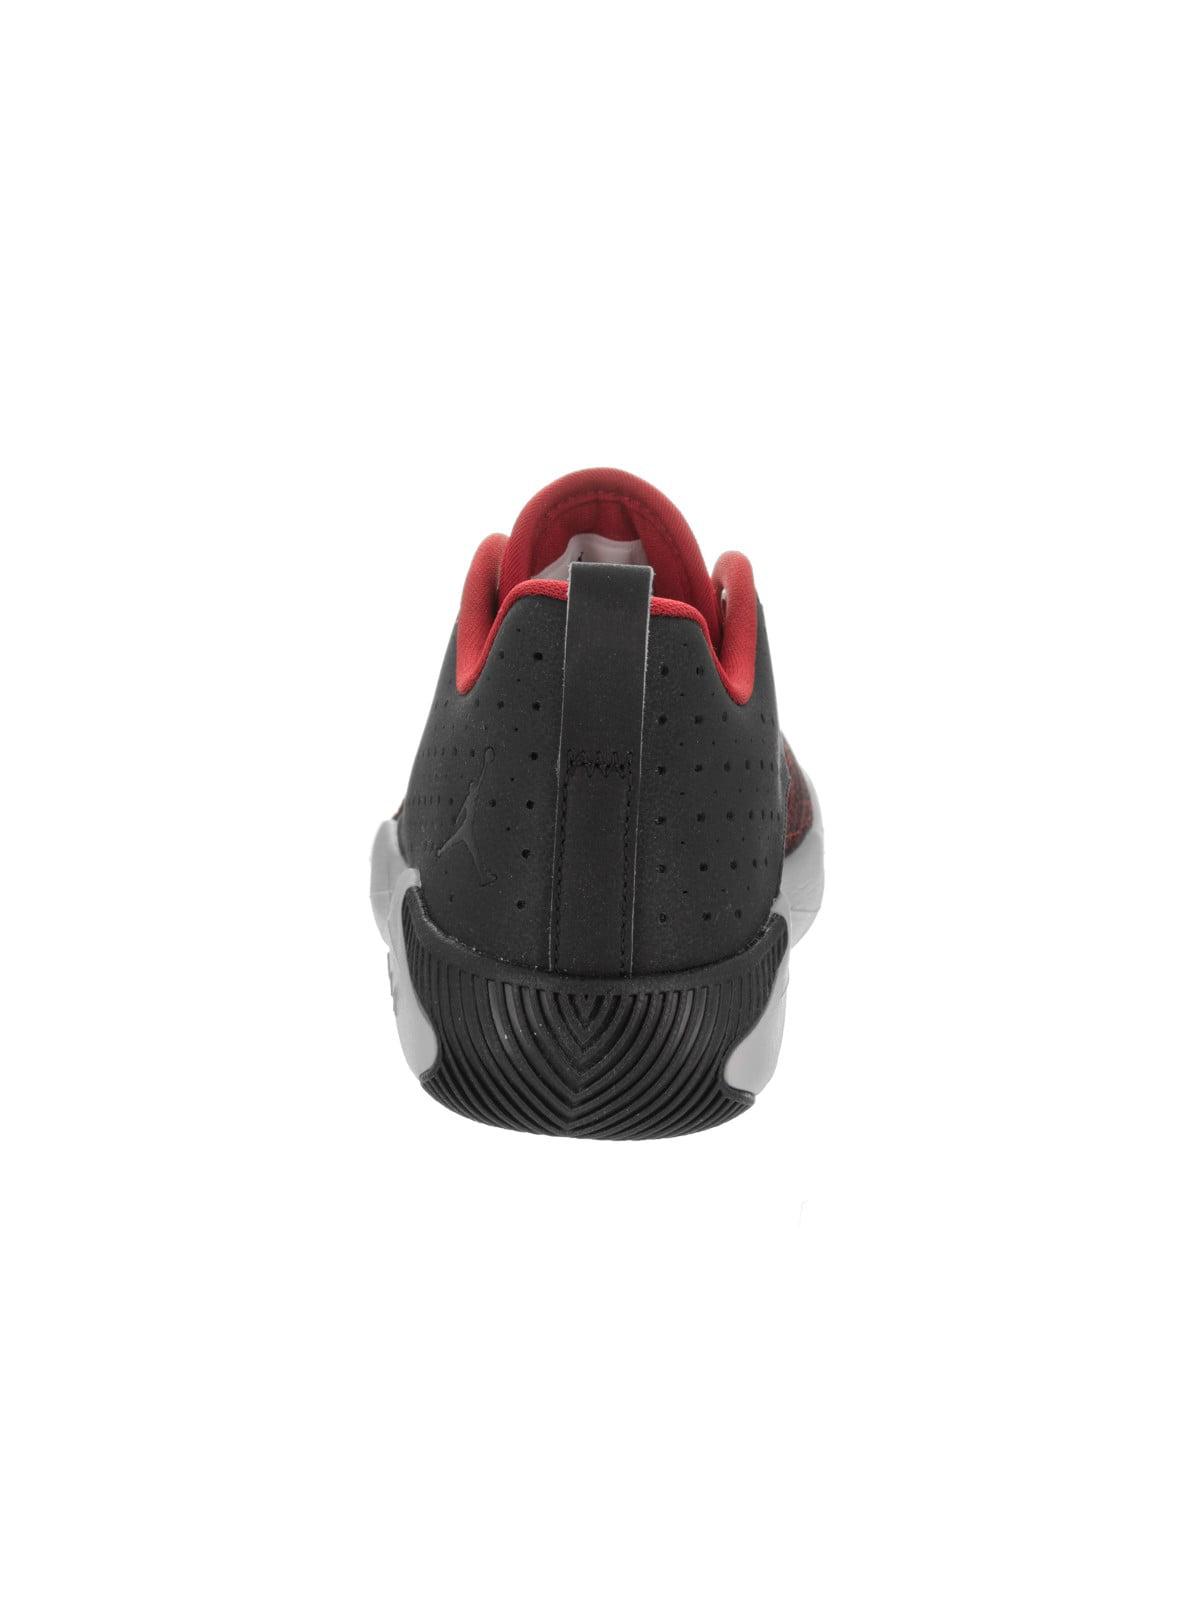 huge selection of a52f3 cbb1f Nike Jordan Kids Jordan 23 Breakout Bg Basketball Shoe